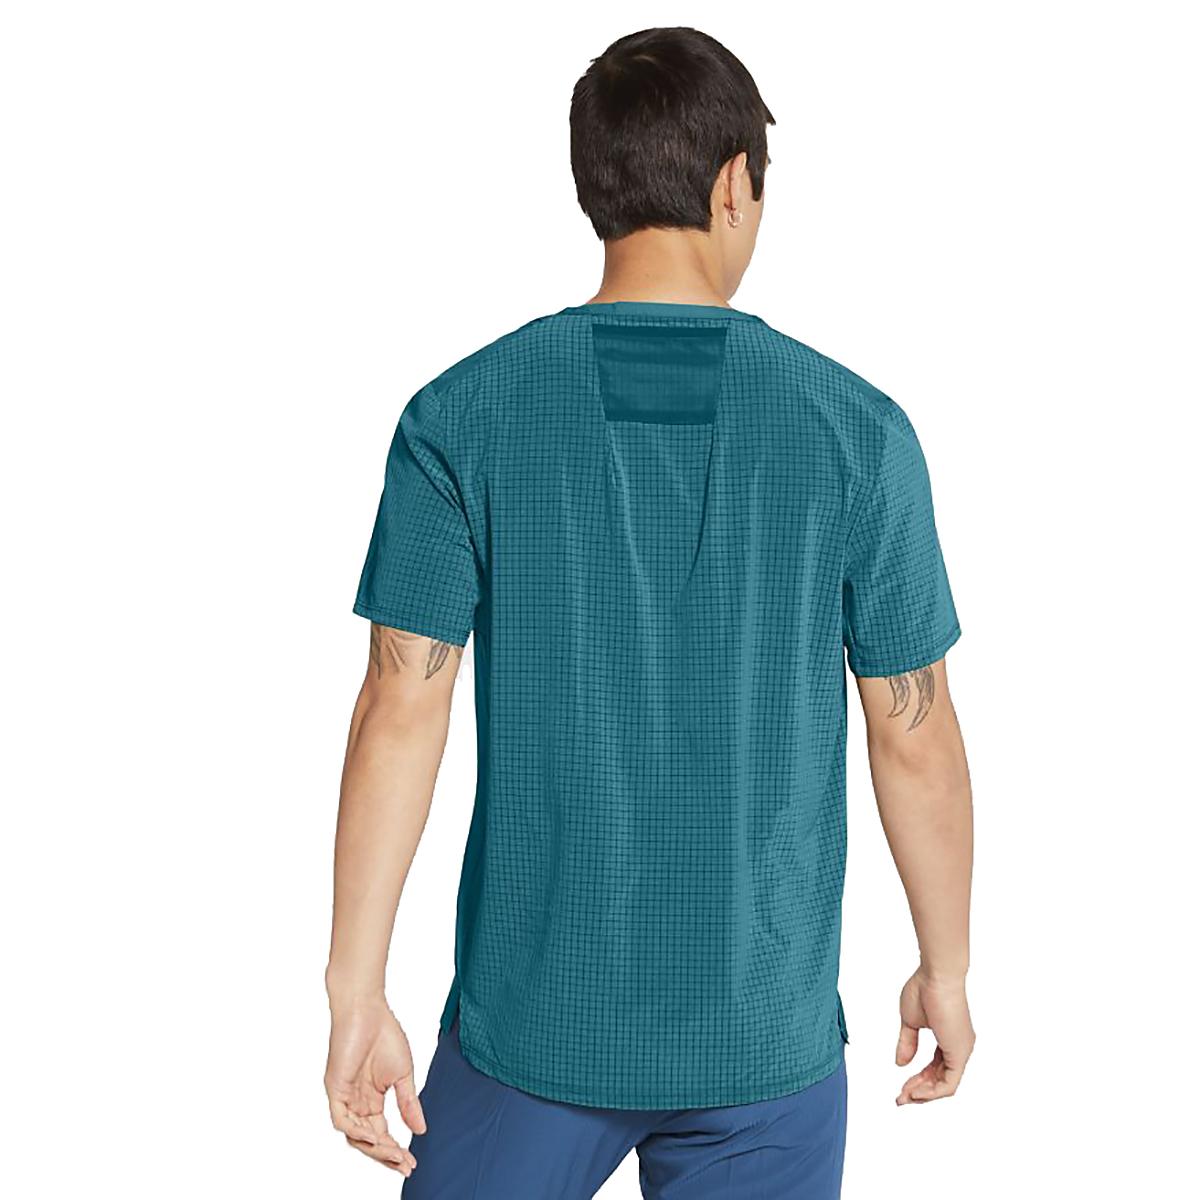 Men's Nike Dri-FIT Rise 365 Short-Sleeve Trail Running Top, , large, image 2